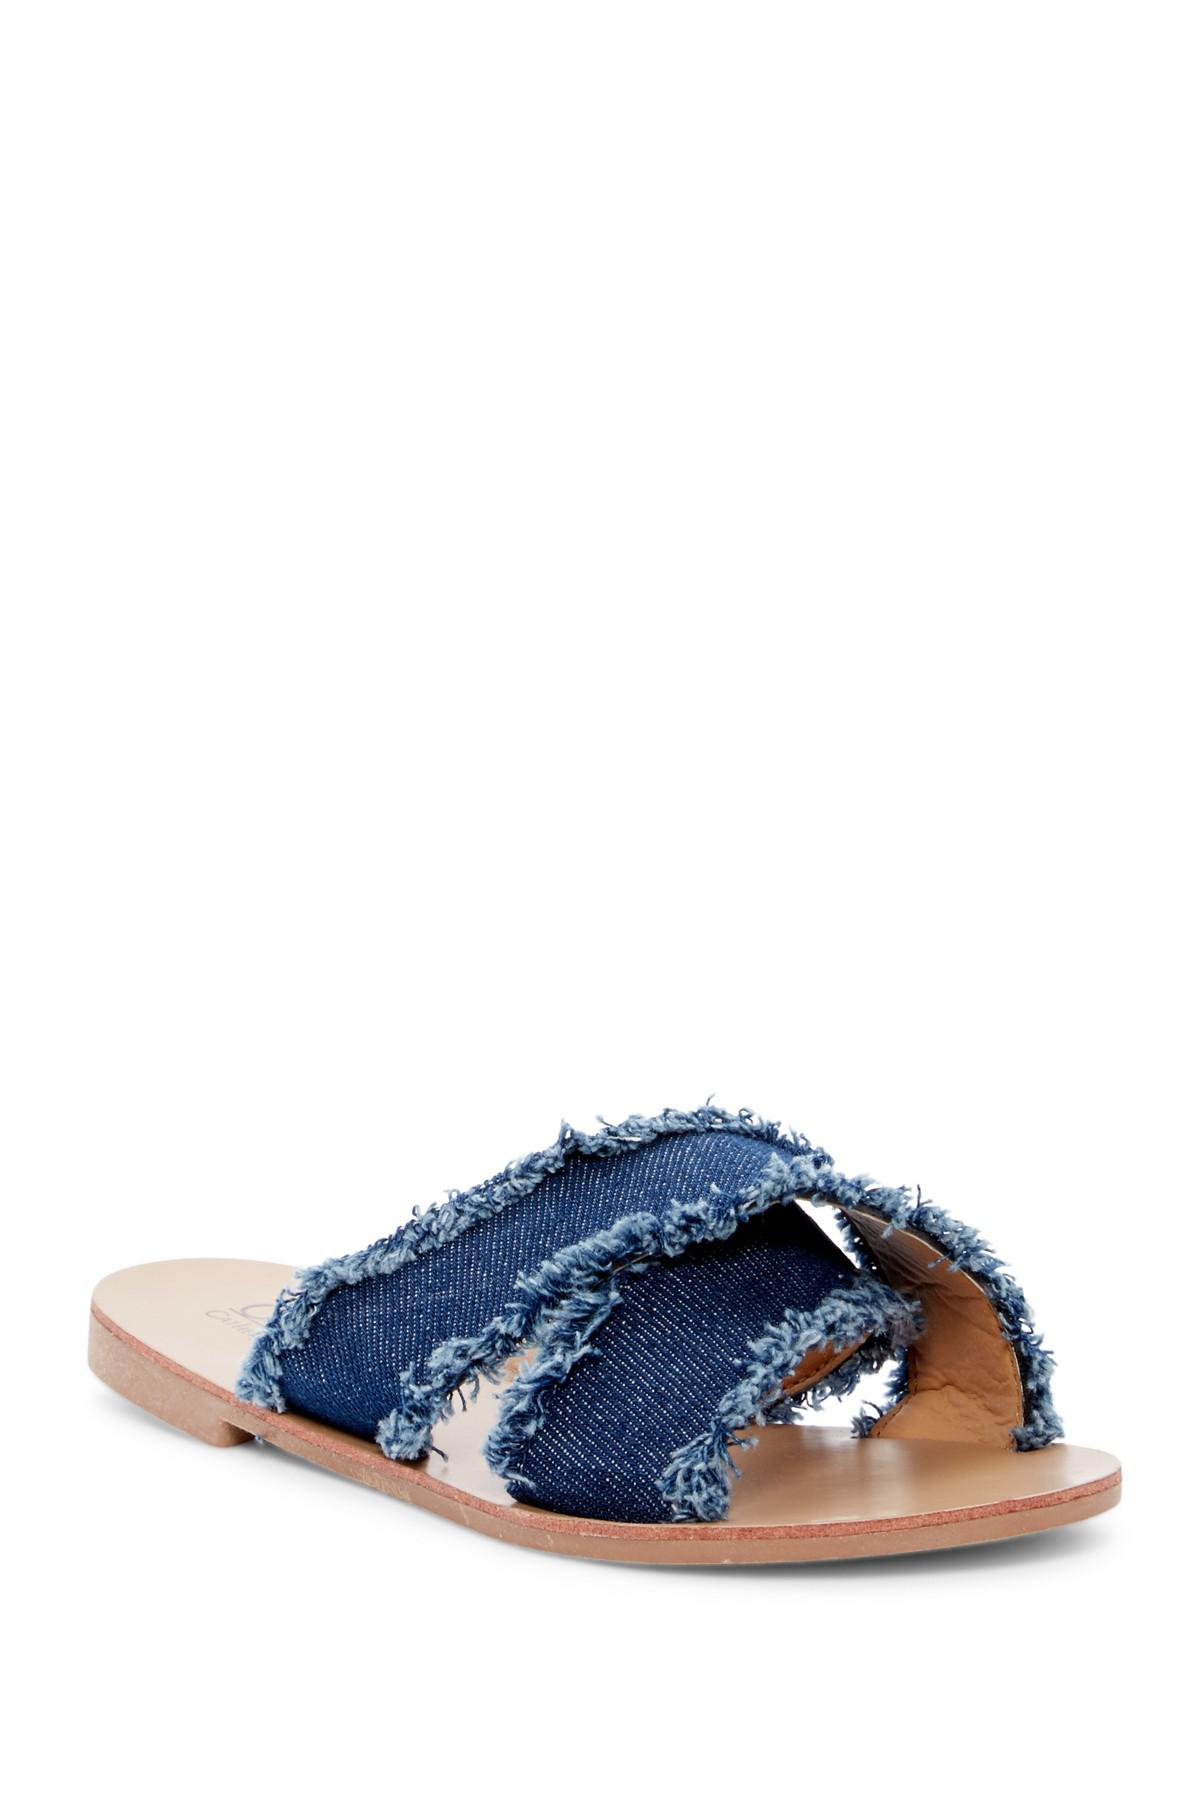 Lyst Catherine Malandrino Crissy Denim Sandal In Blue